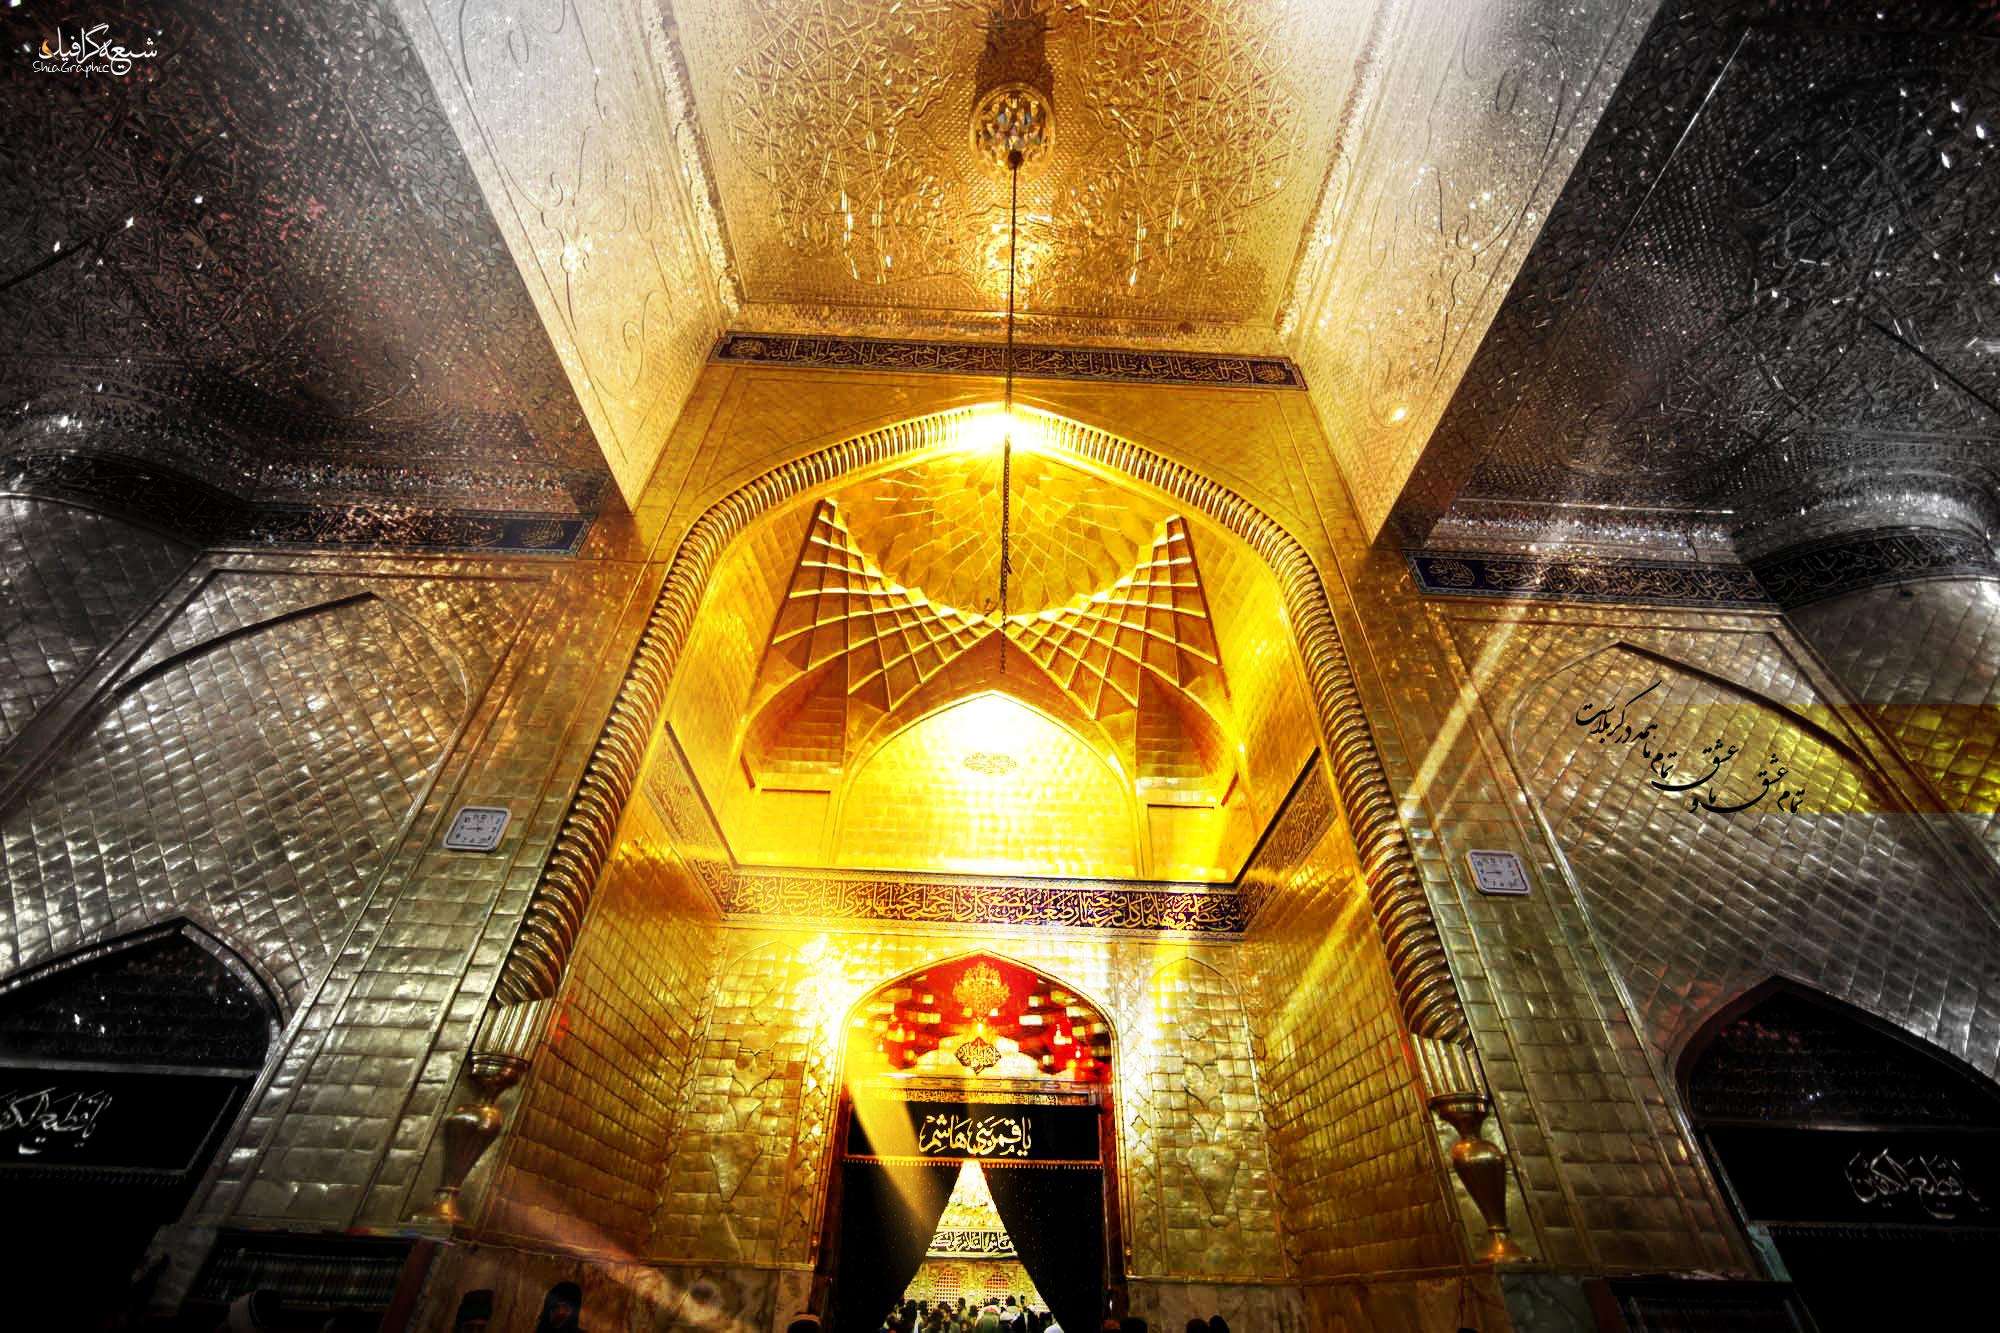 http://sahebnews.ir/files/uploads/2013/12/ya-abalfazl_by_shiagraphic.jpg